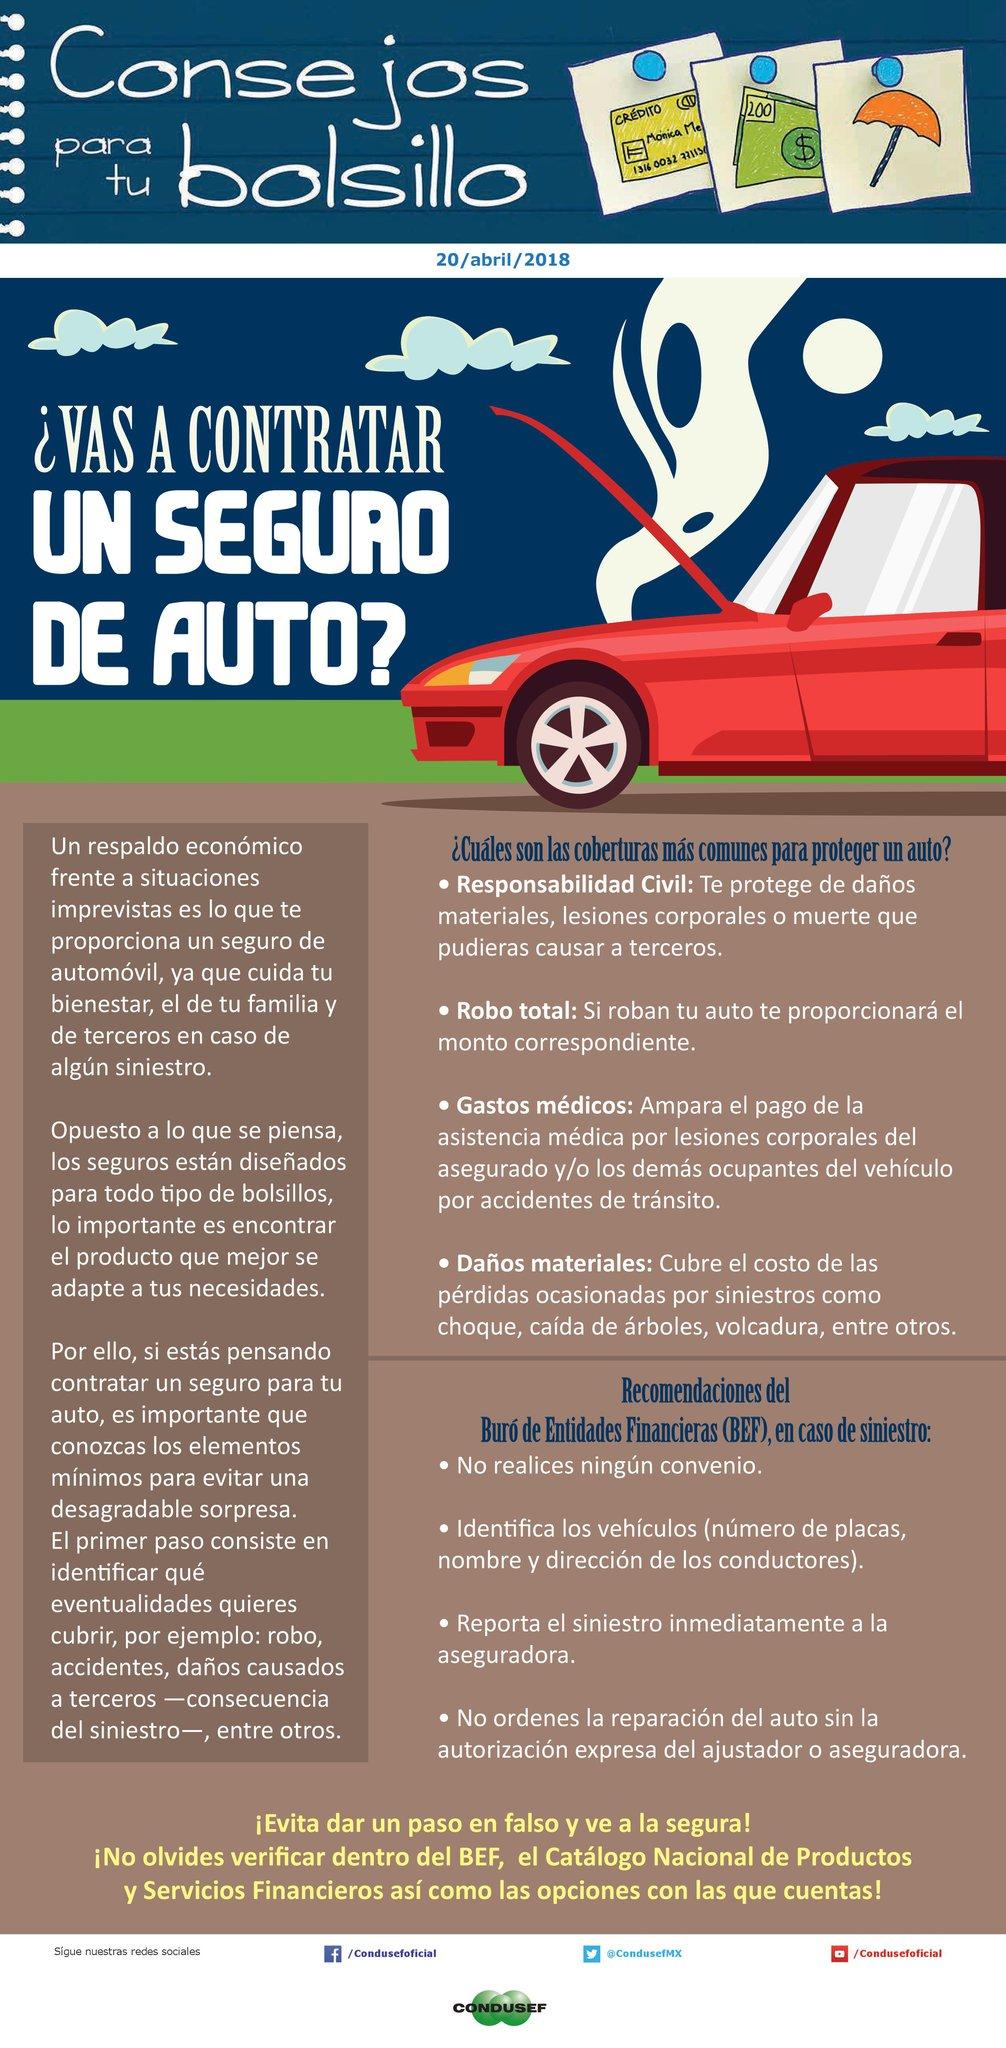 ¿Vas a contratar un seguro de auto?